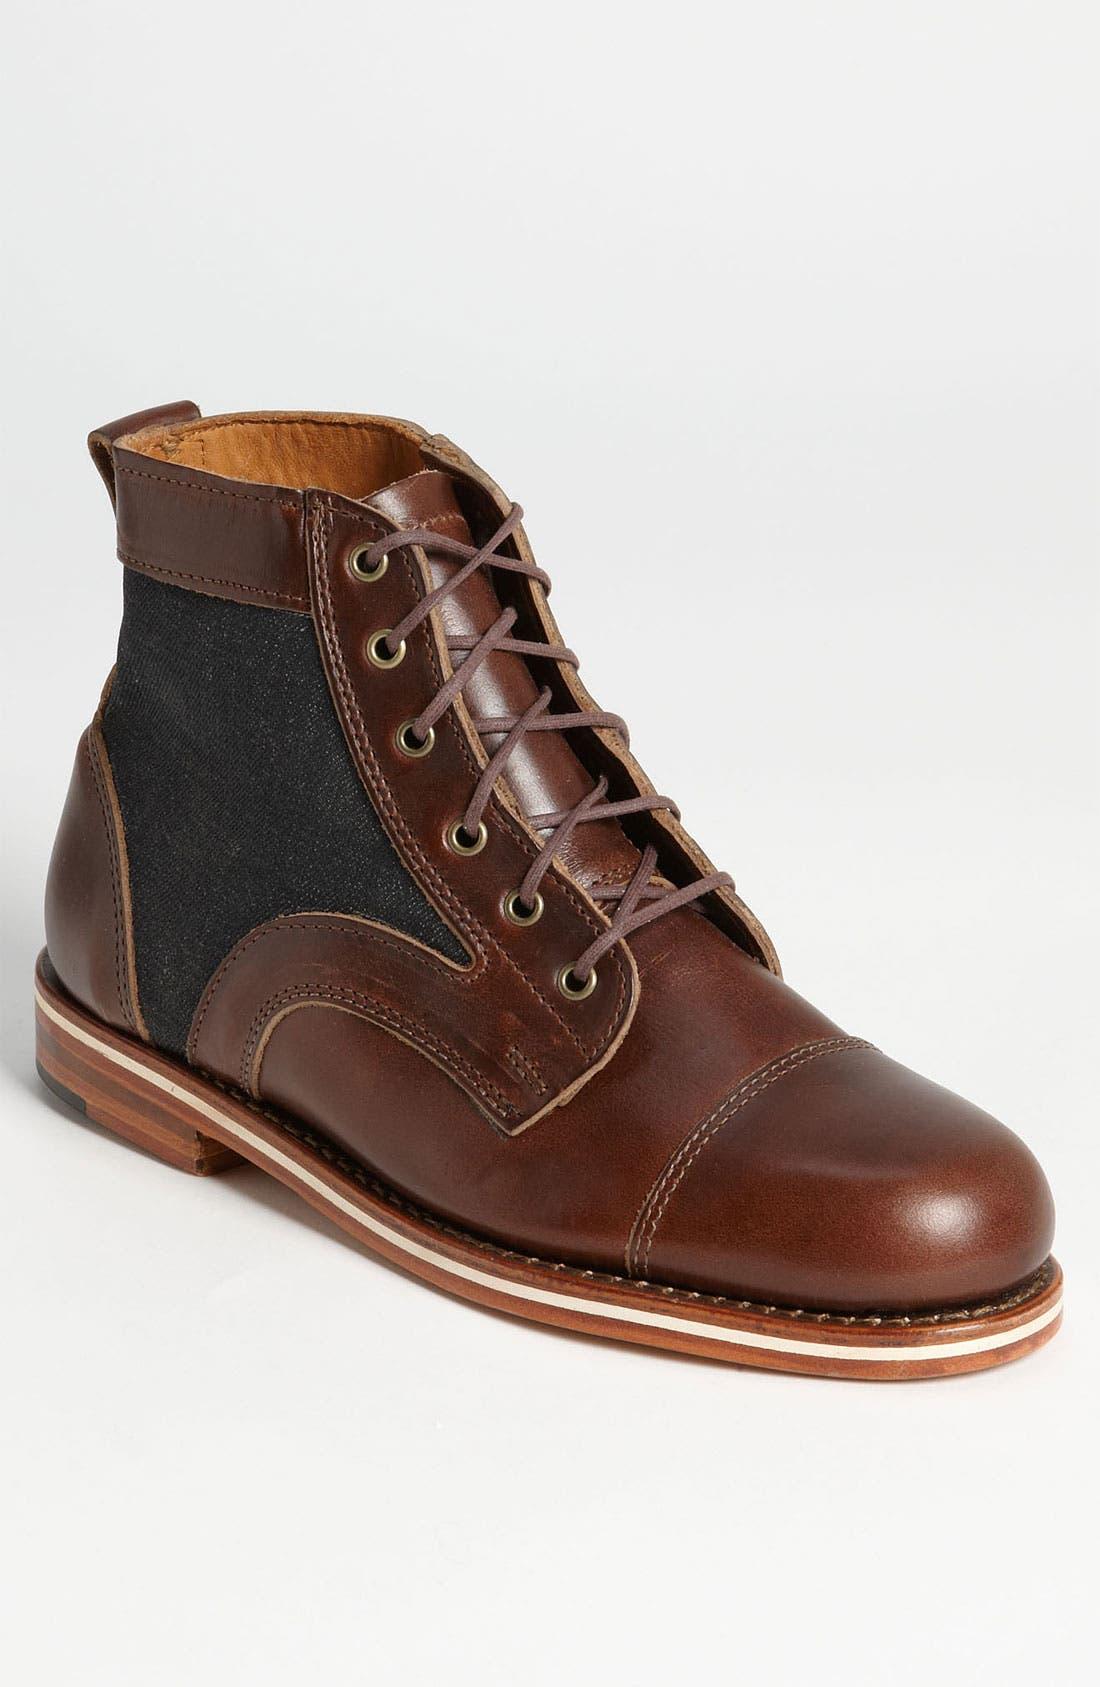 HELM 'Reid' Cap Toe Boot, Main, color, 200